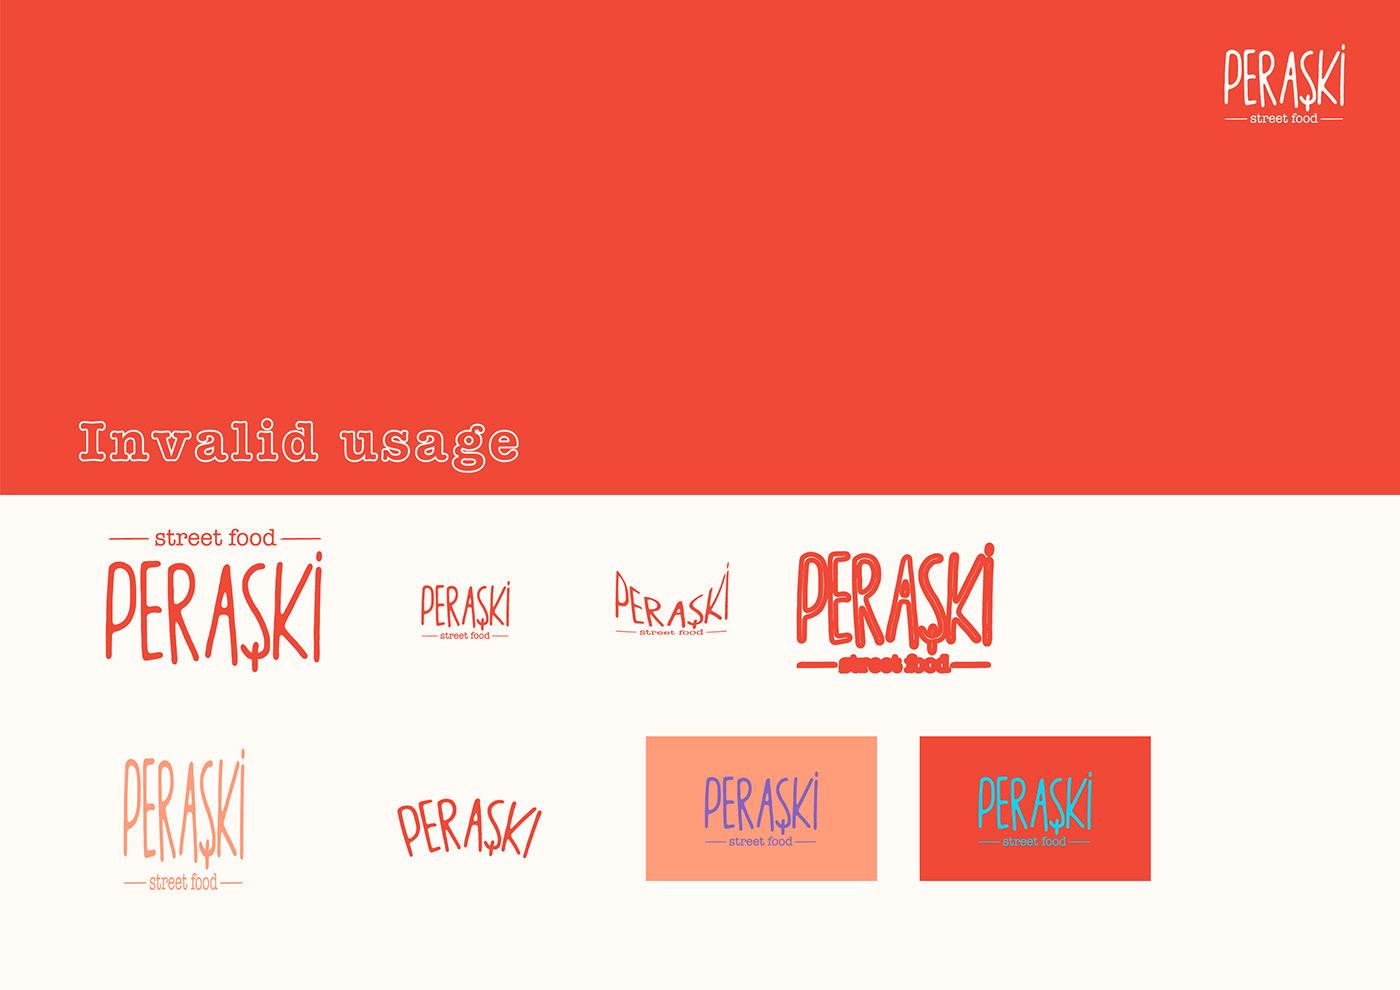 bakery branding  logo Packaging пирожки Food  pirashki fastfood Street Food doodle